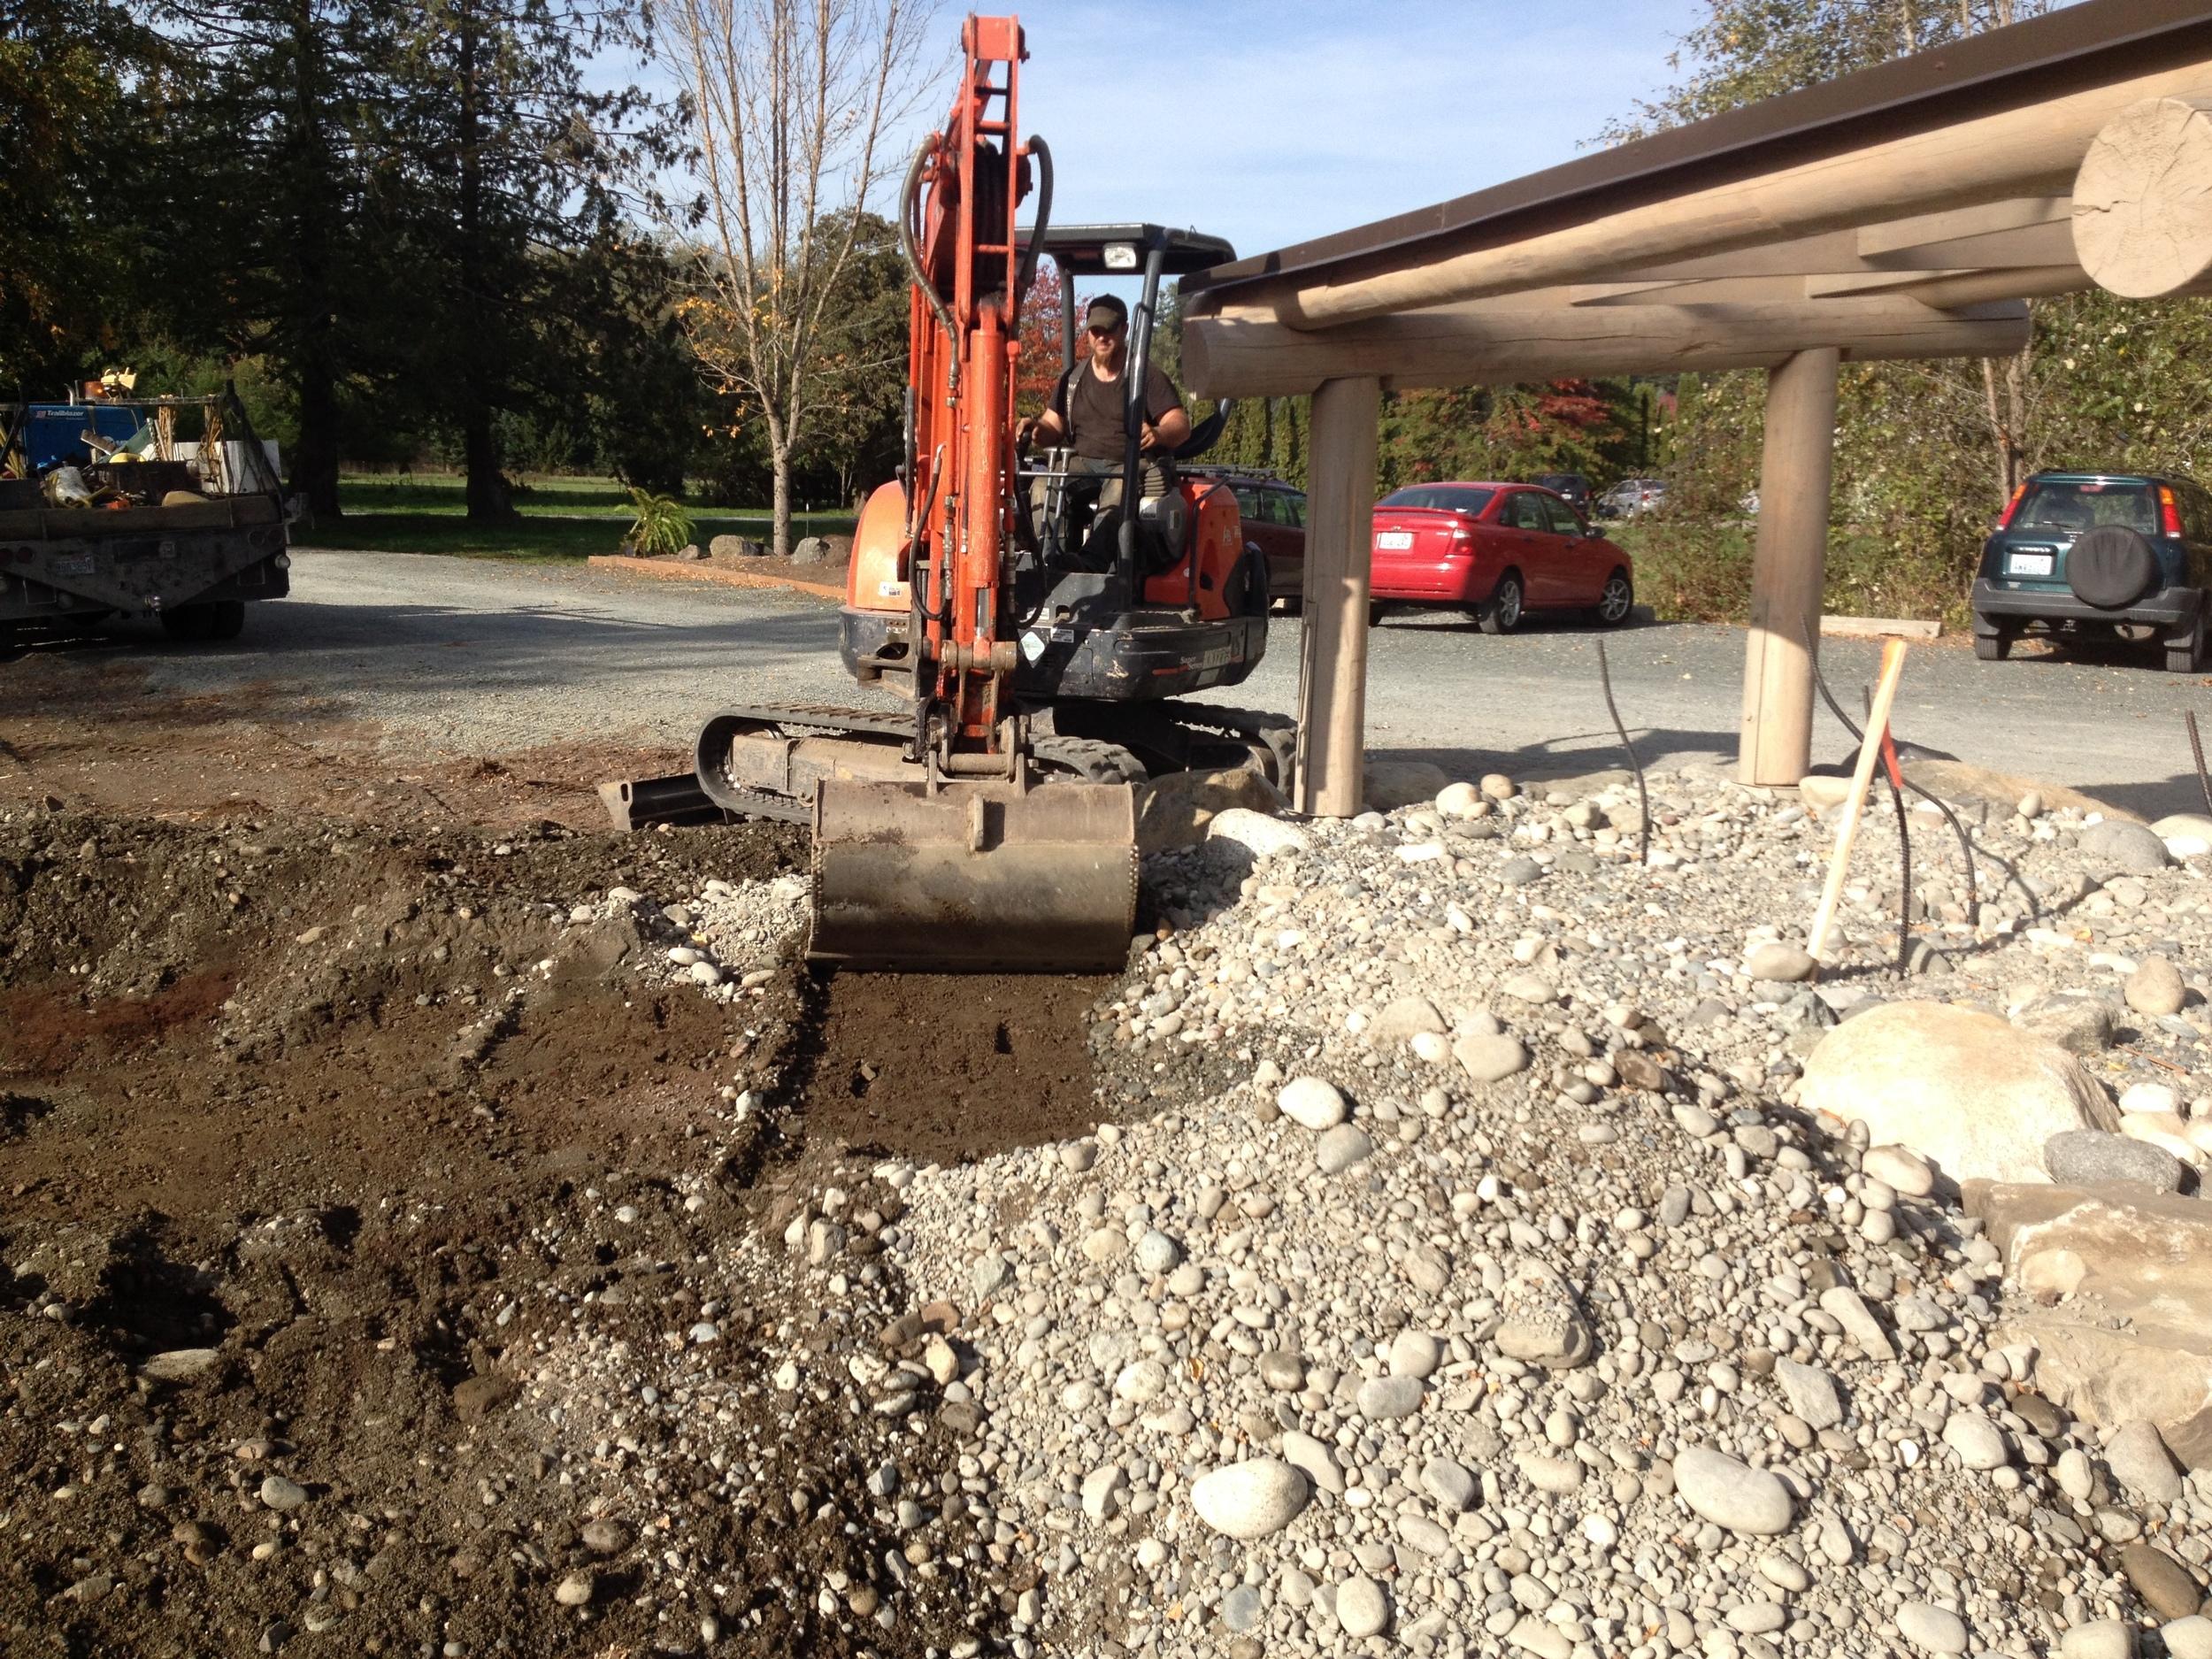 Stream Channel Excavation for Native Plant Garden - In progress, Oct 2015